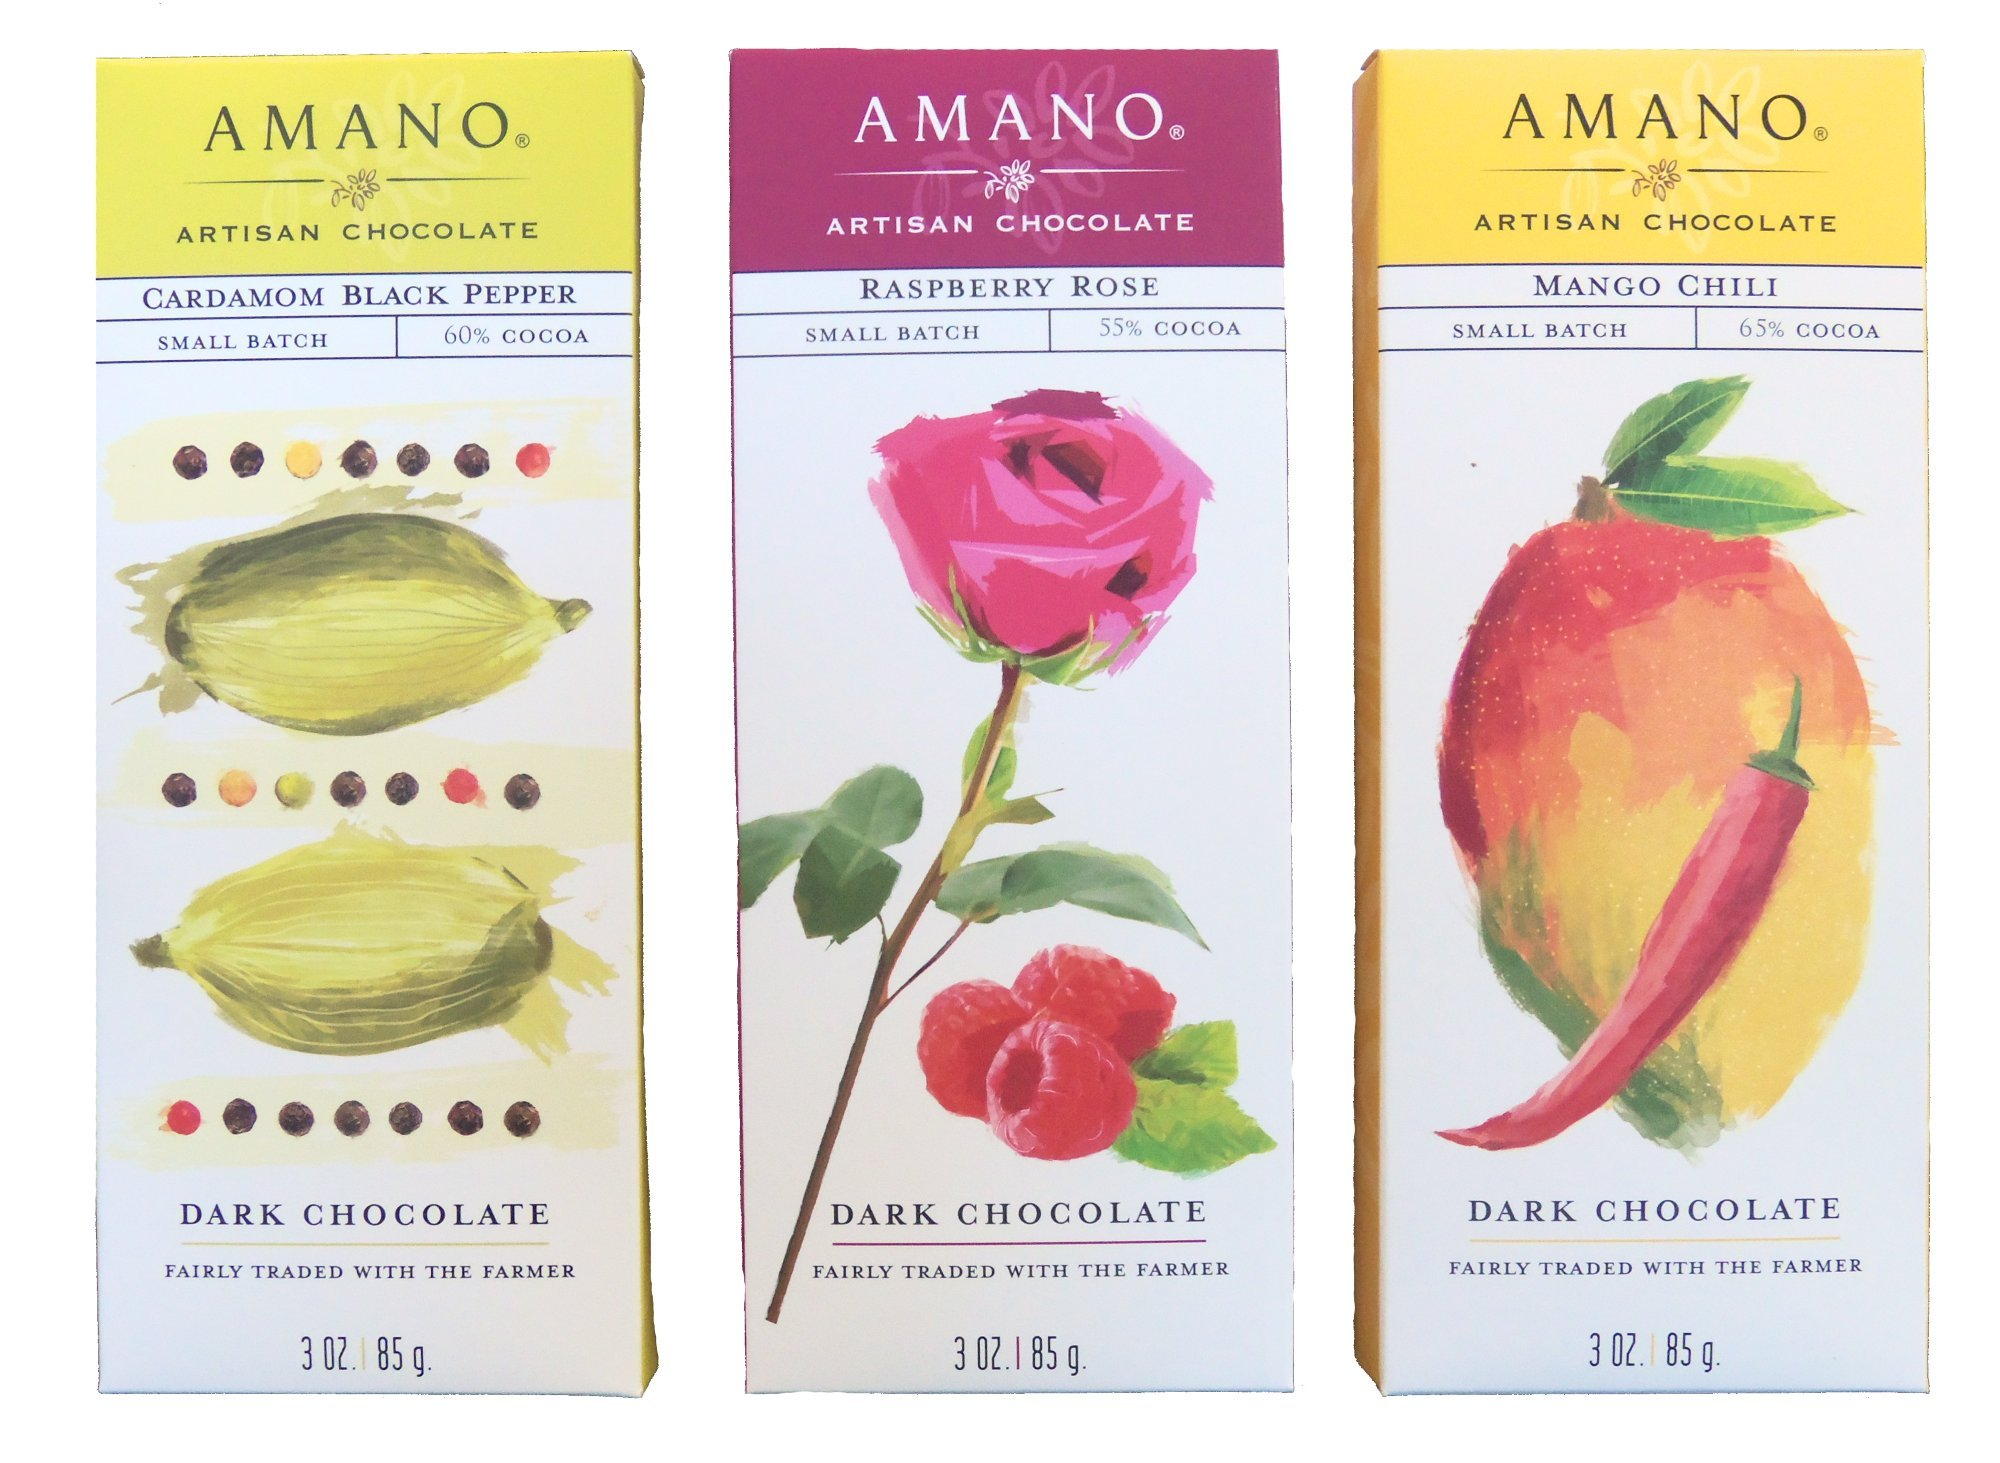 Amano Artisan Flavored Dark Chocolate Bar Variety Trio - Cardamom Black Pepper, Raspberry Rose, & Mango Chili - 3 Bars, 3 Ounces Per Bar - International Chocolate Awards Winners! by Amano